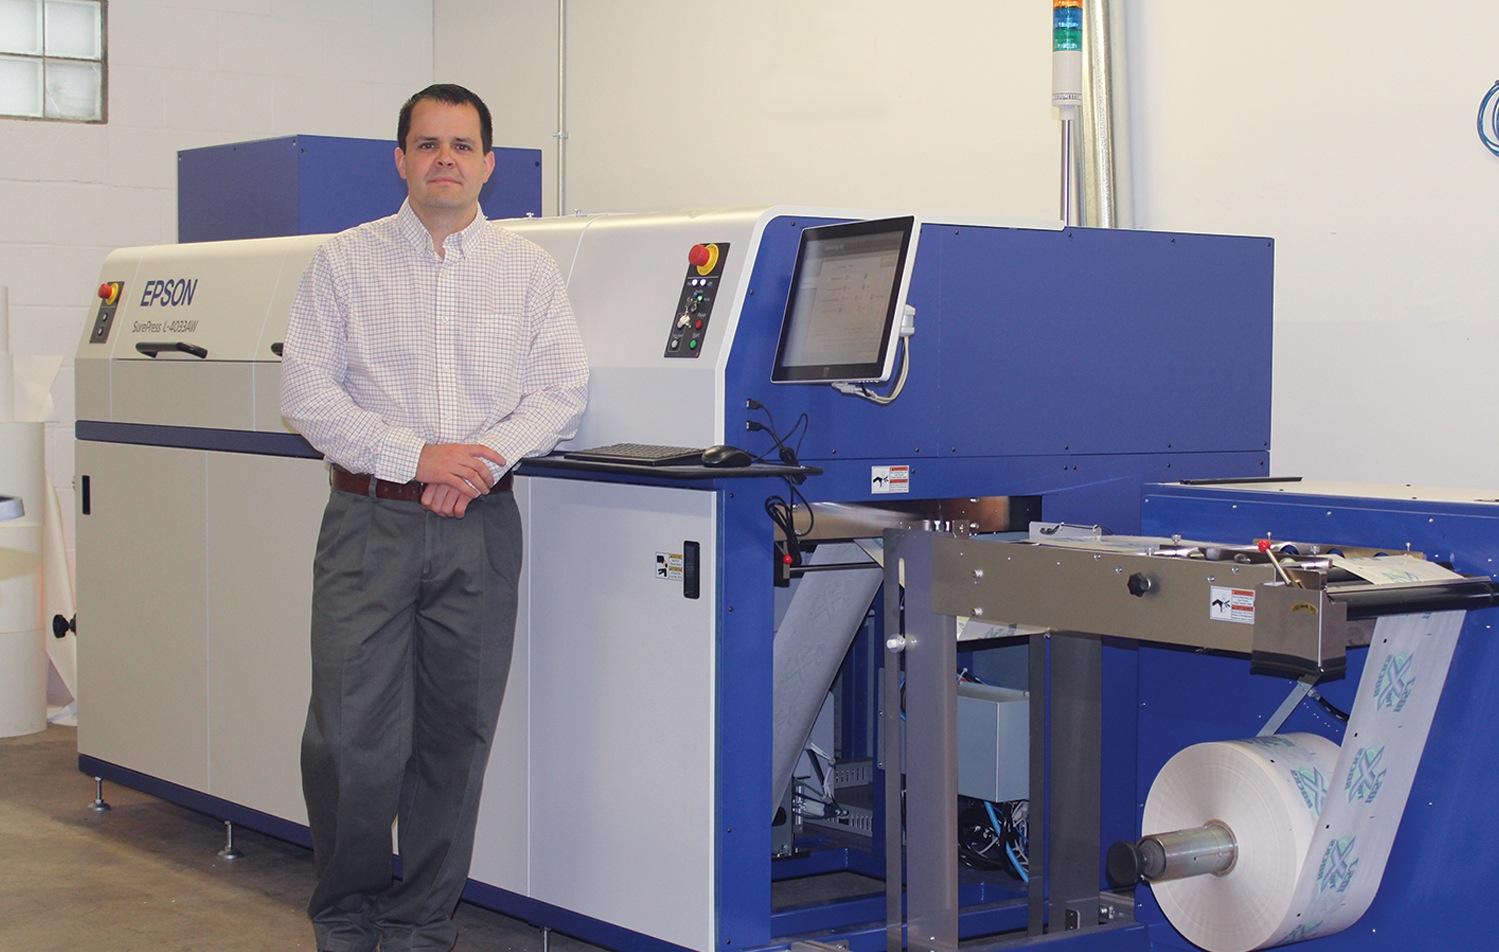 Beiler Printing Selects Epson SurePress Digital Label Press to Deliver Custom Labels